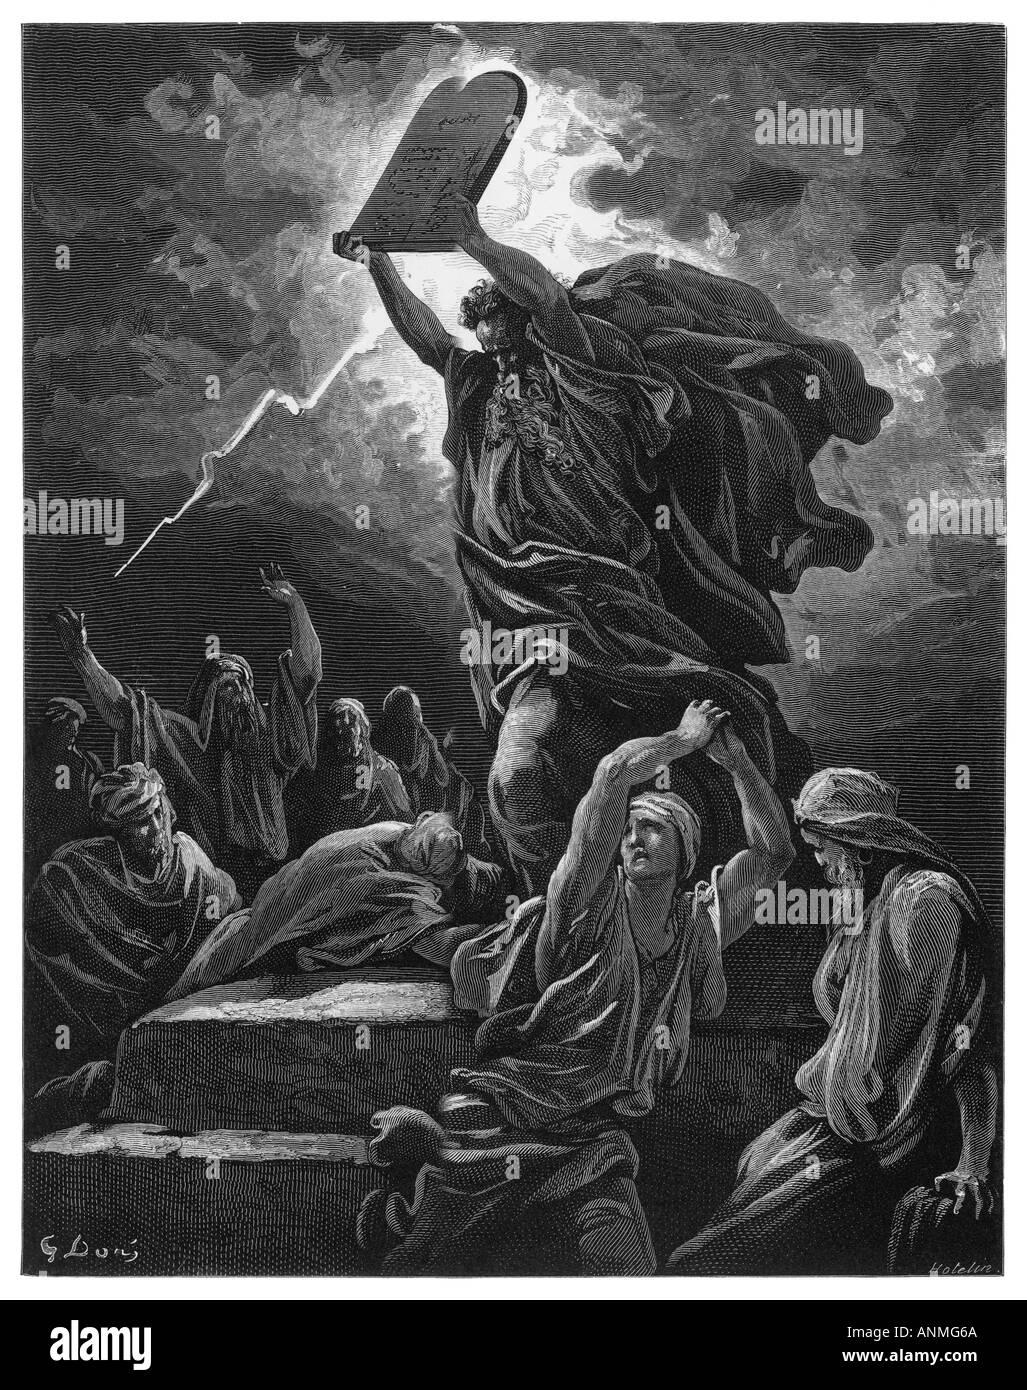 Moses 10 Commandments - Stock Image